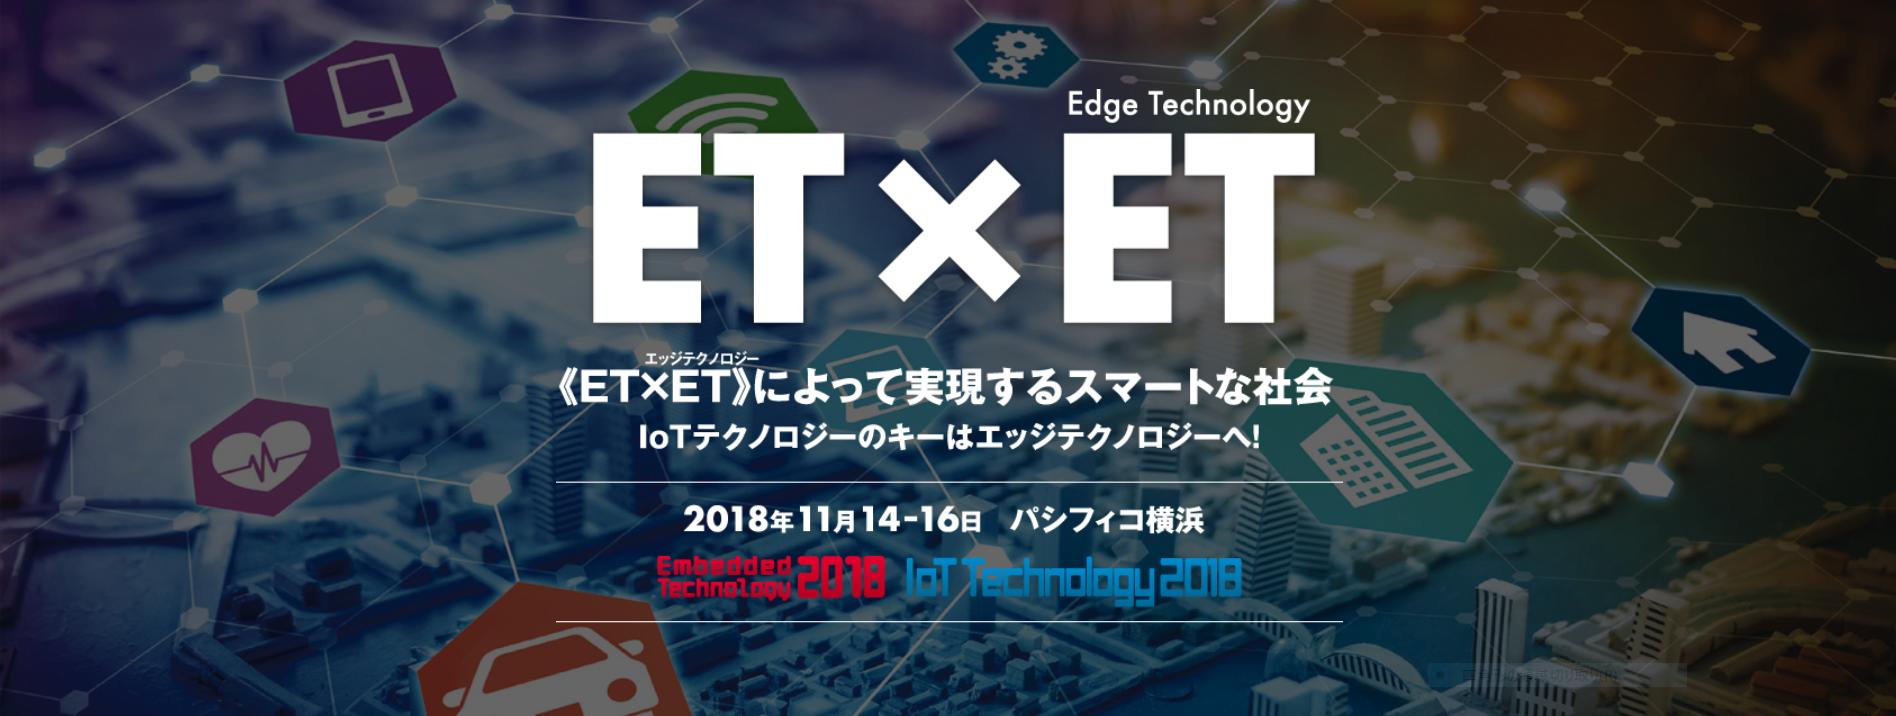 ET&Iot Technology 2018